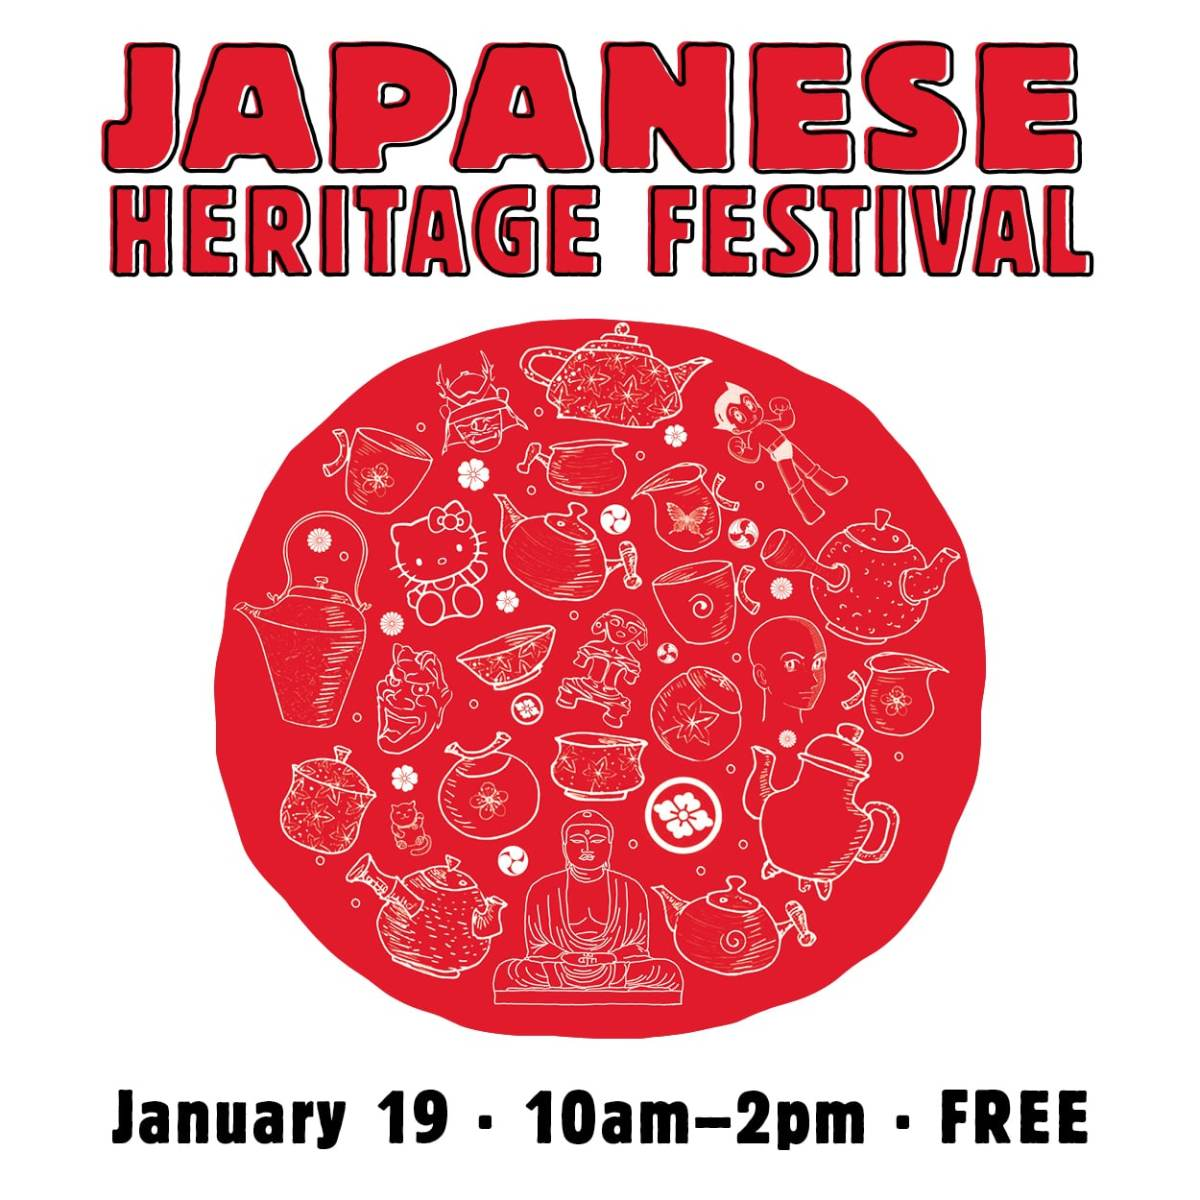 Japanese Heritage Festival